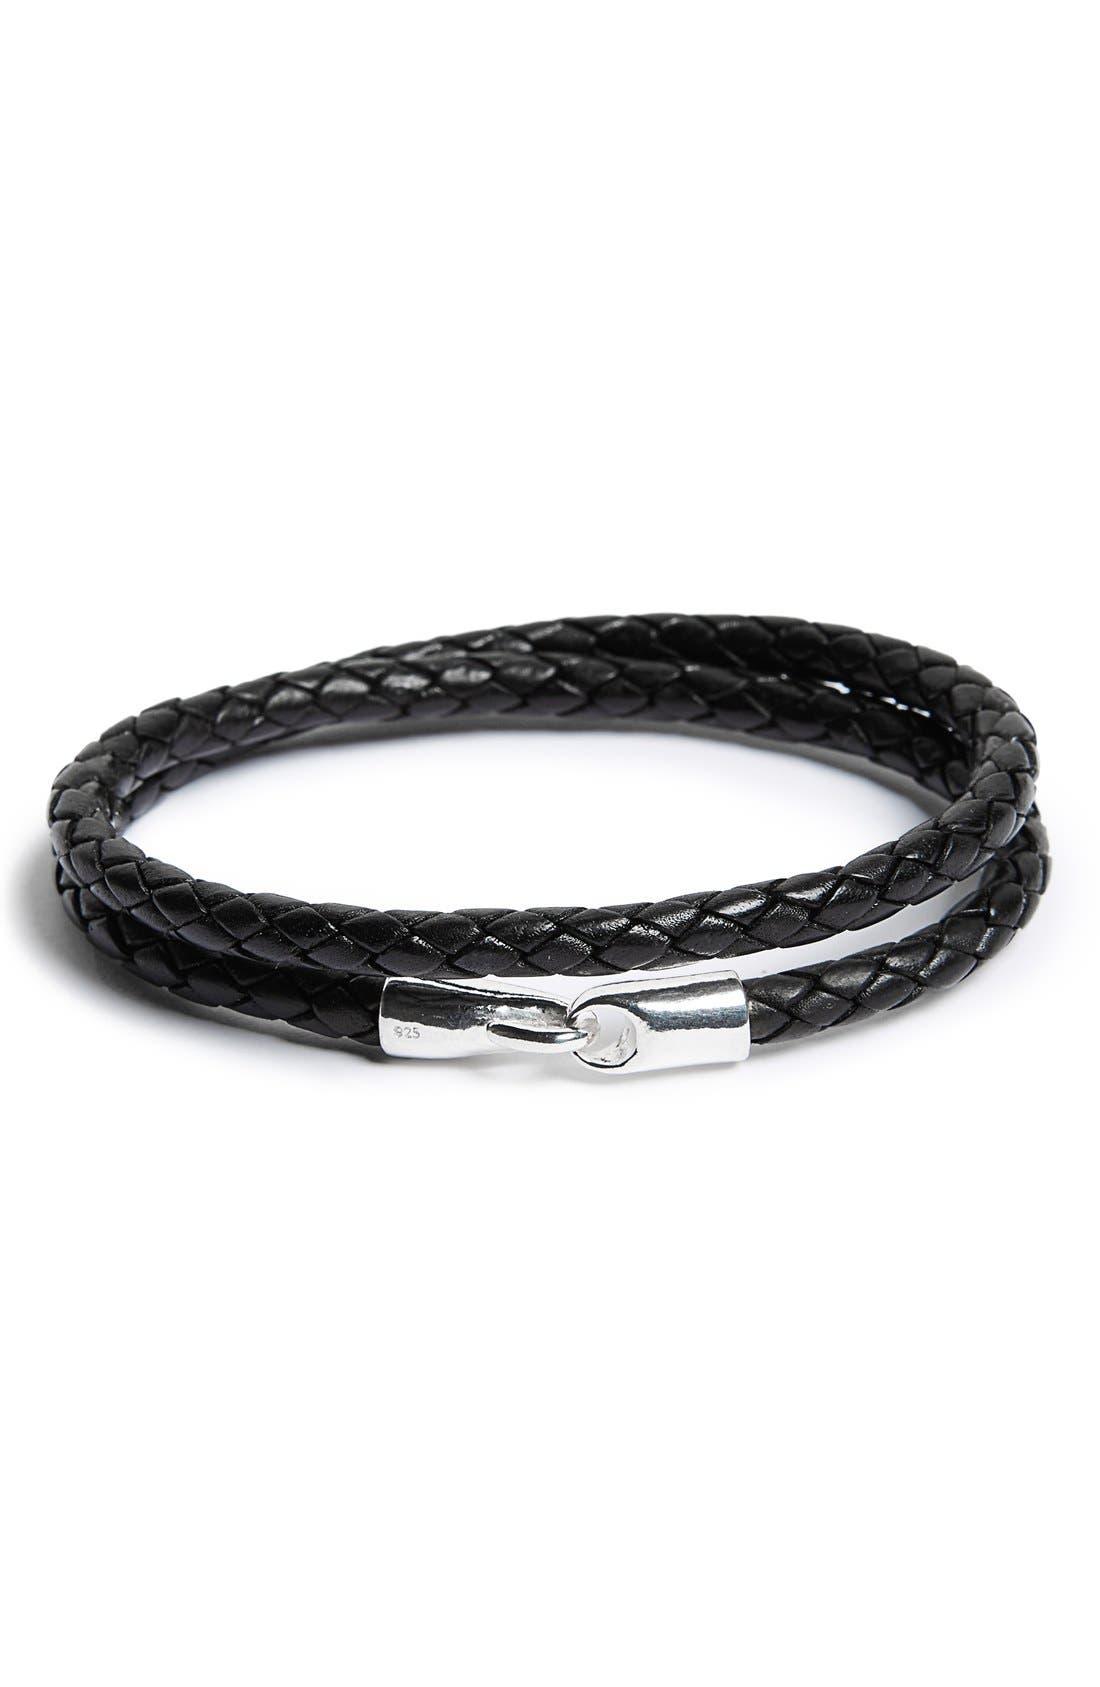 Main Image - Caputo & Co. Leather Wrap Bracelet